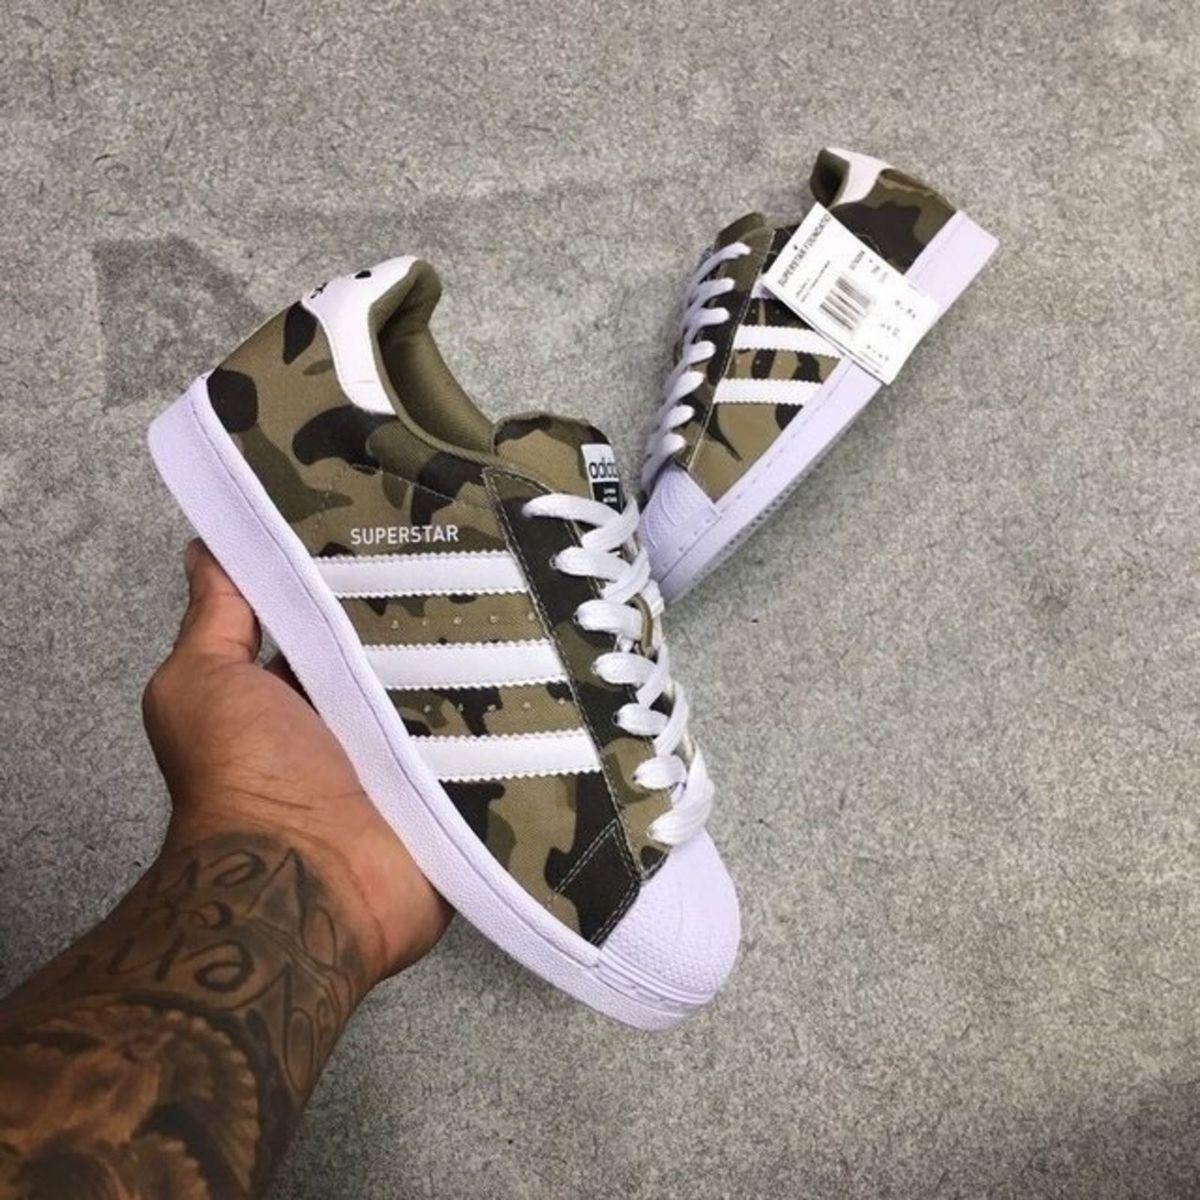 04373c090d5 Adidas Superstar - Camuflado